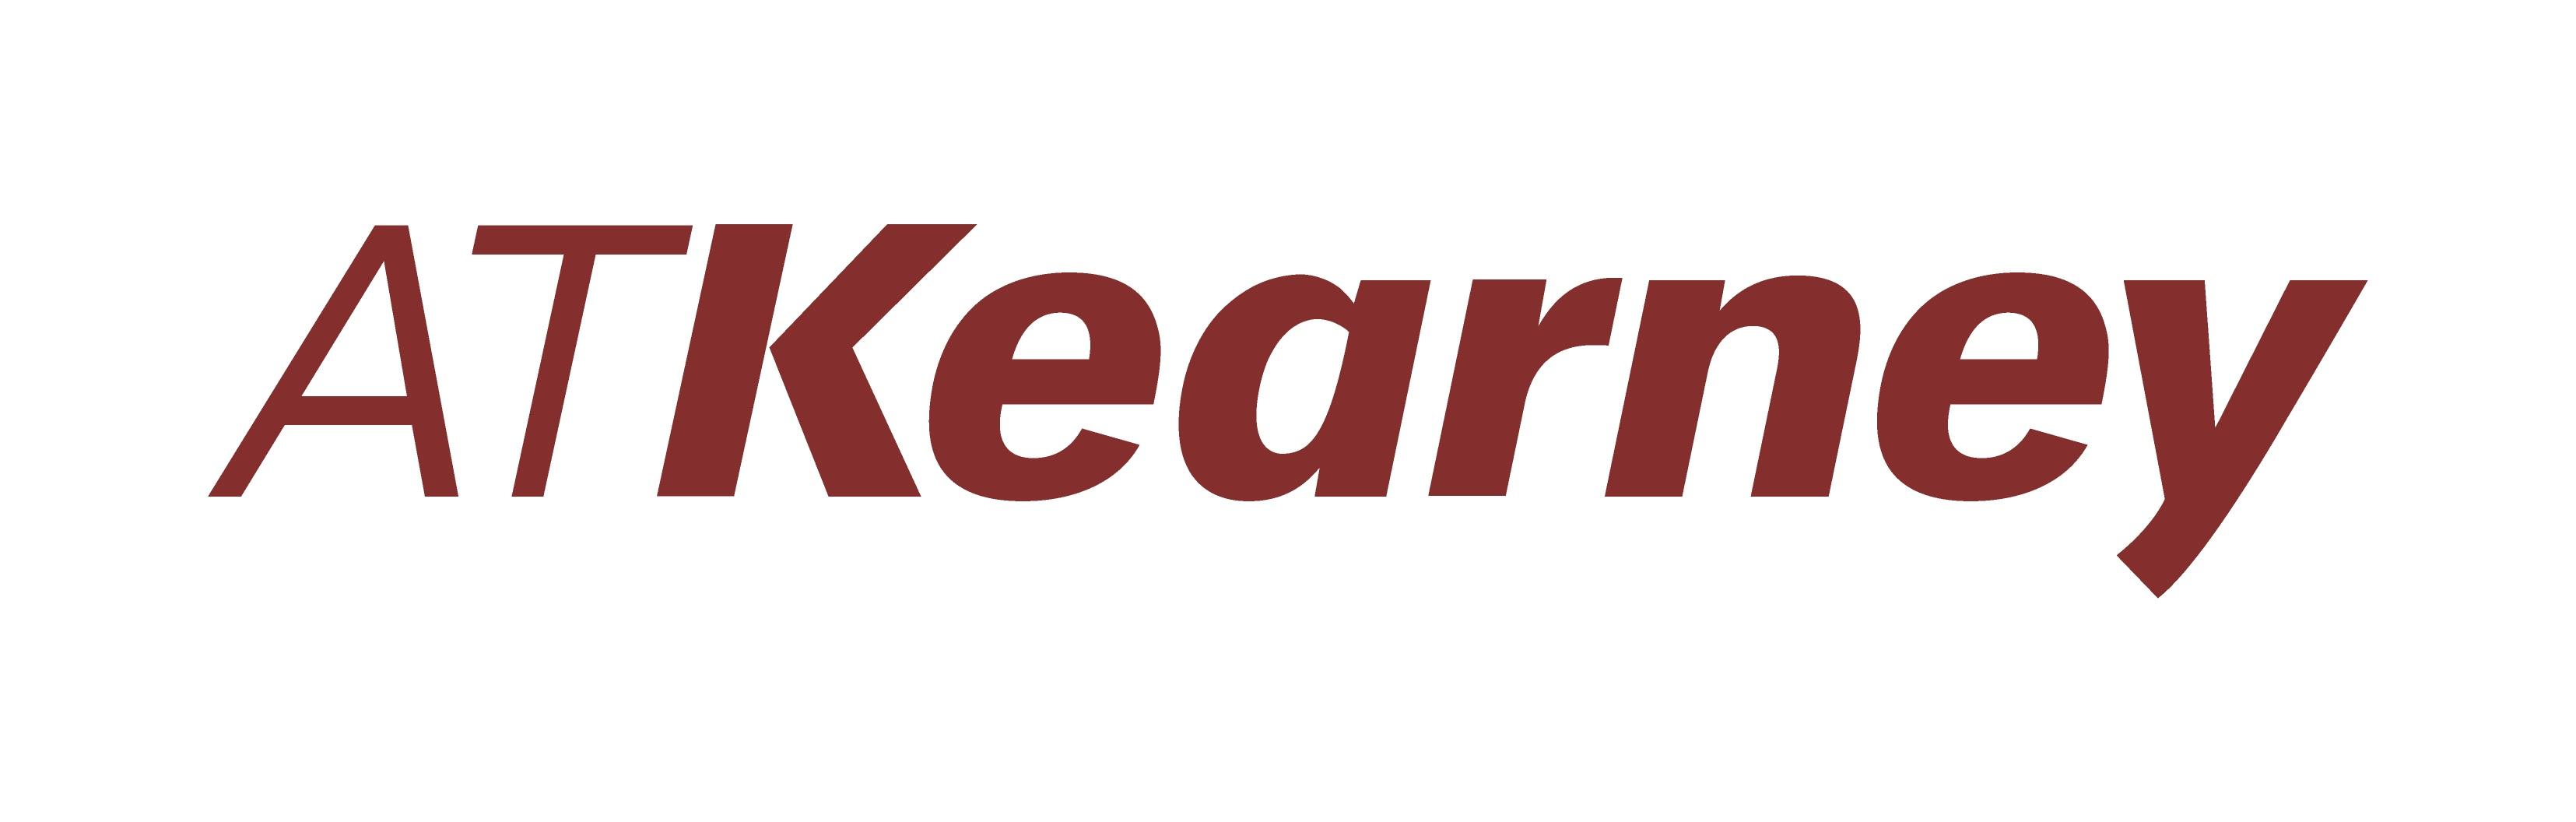 ATKearney-logo